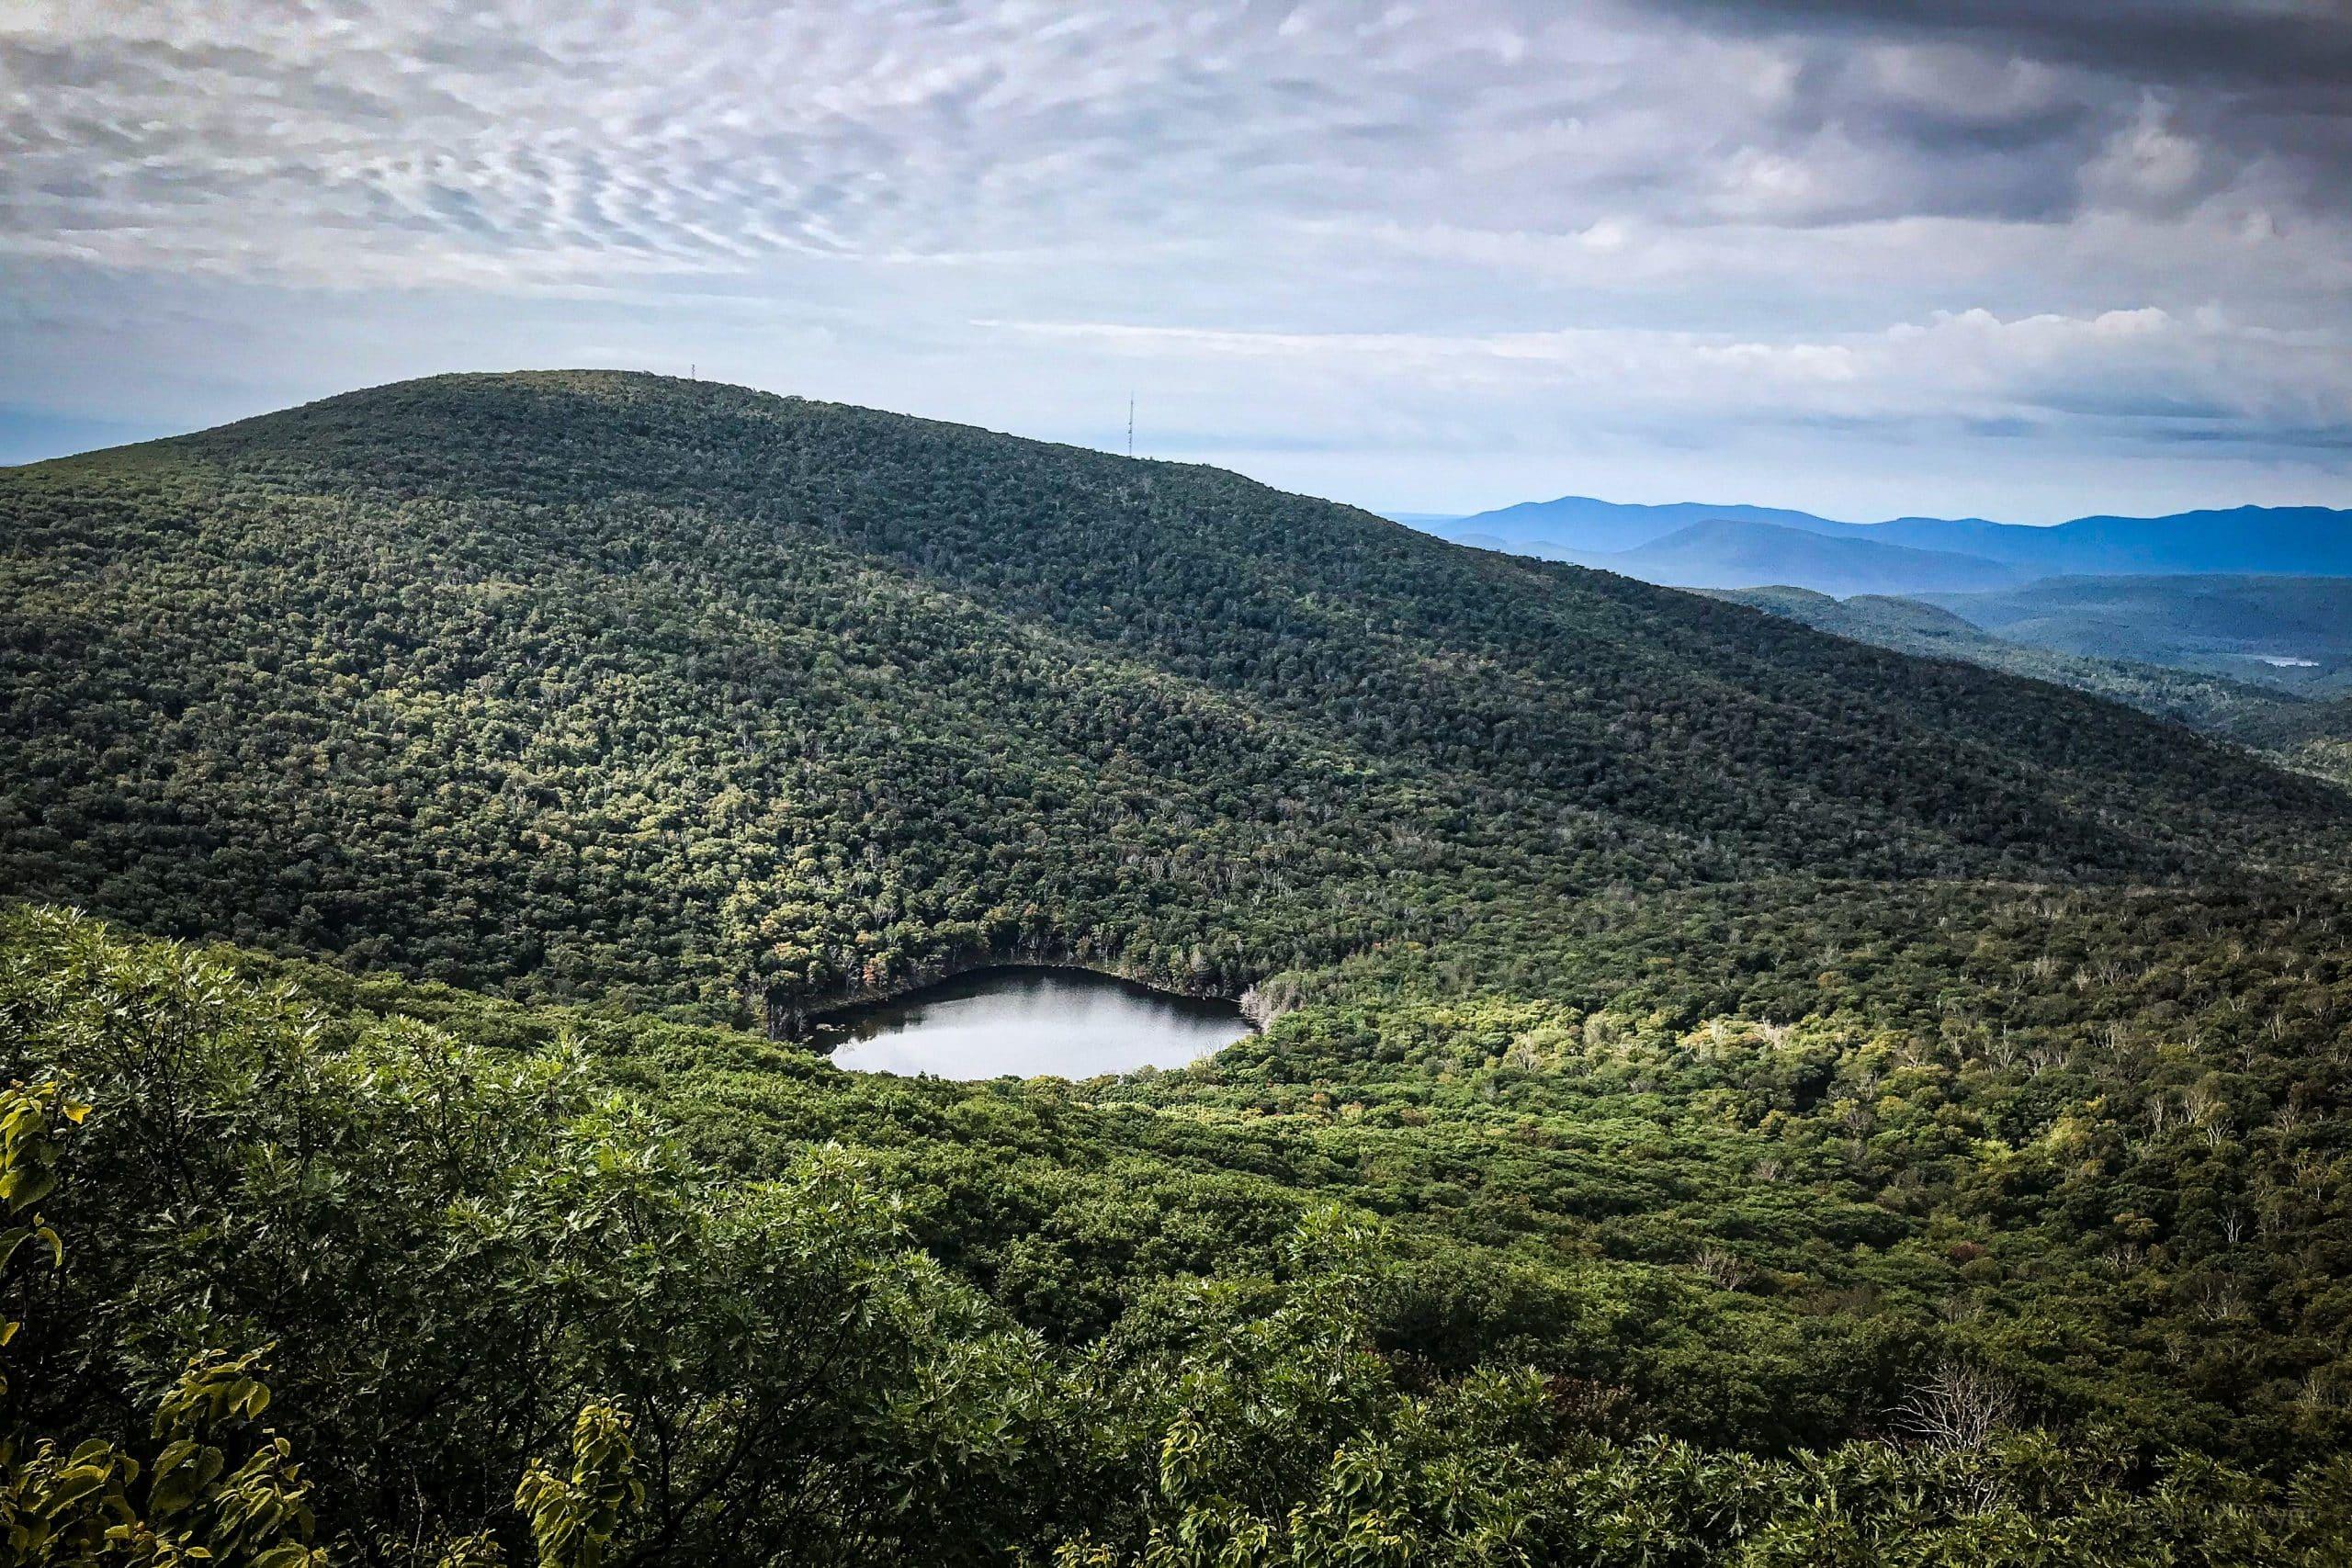 Echo Lake and Overlook Mountain from Plattekill Mountain